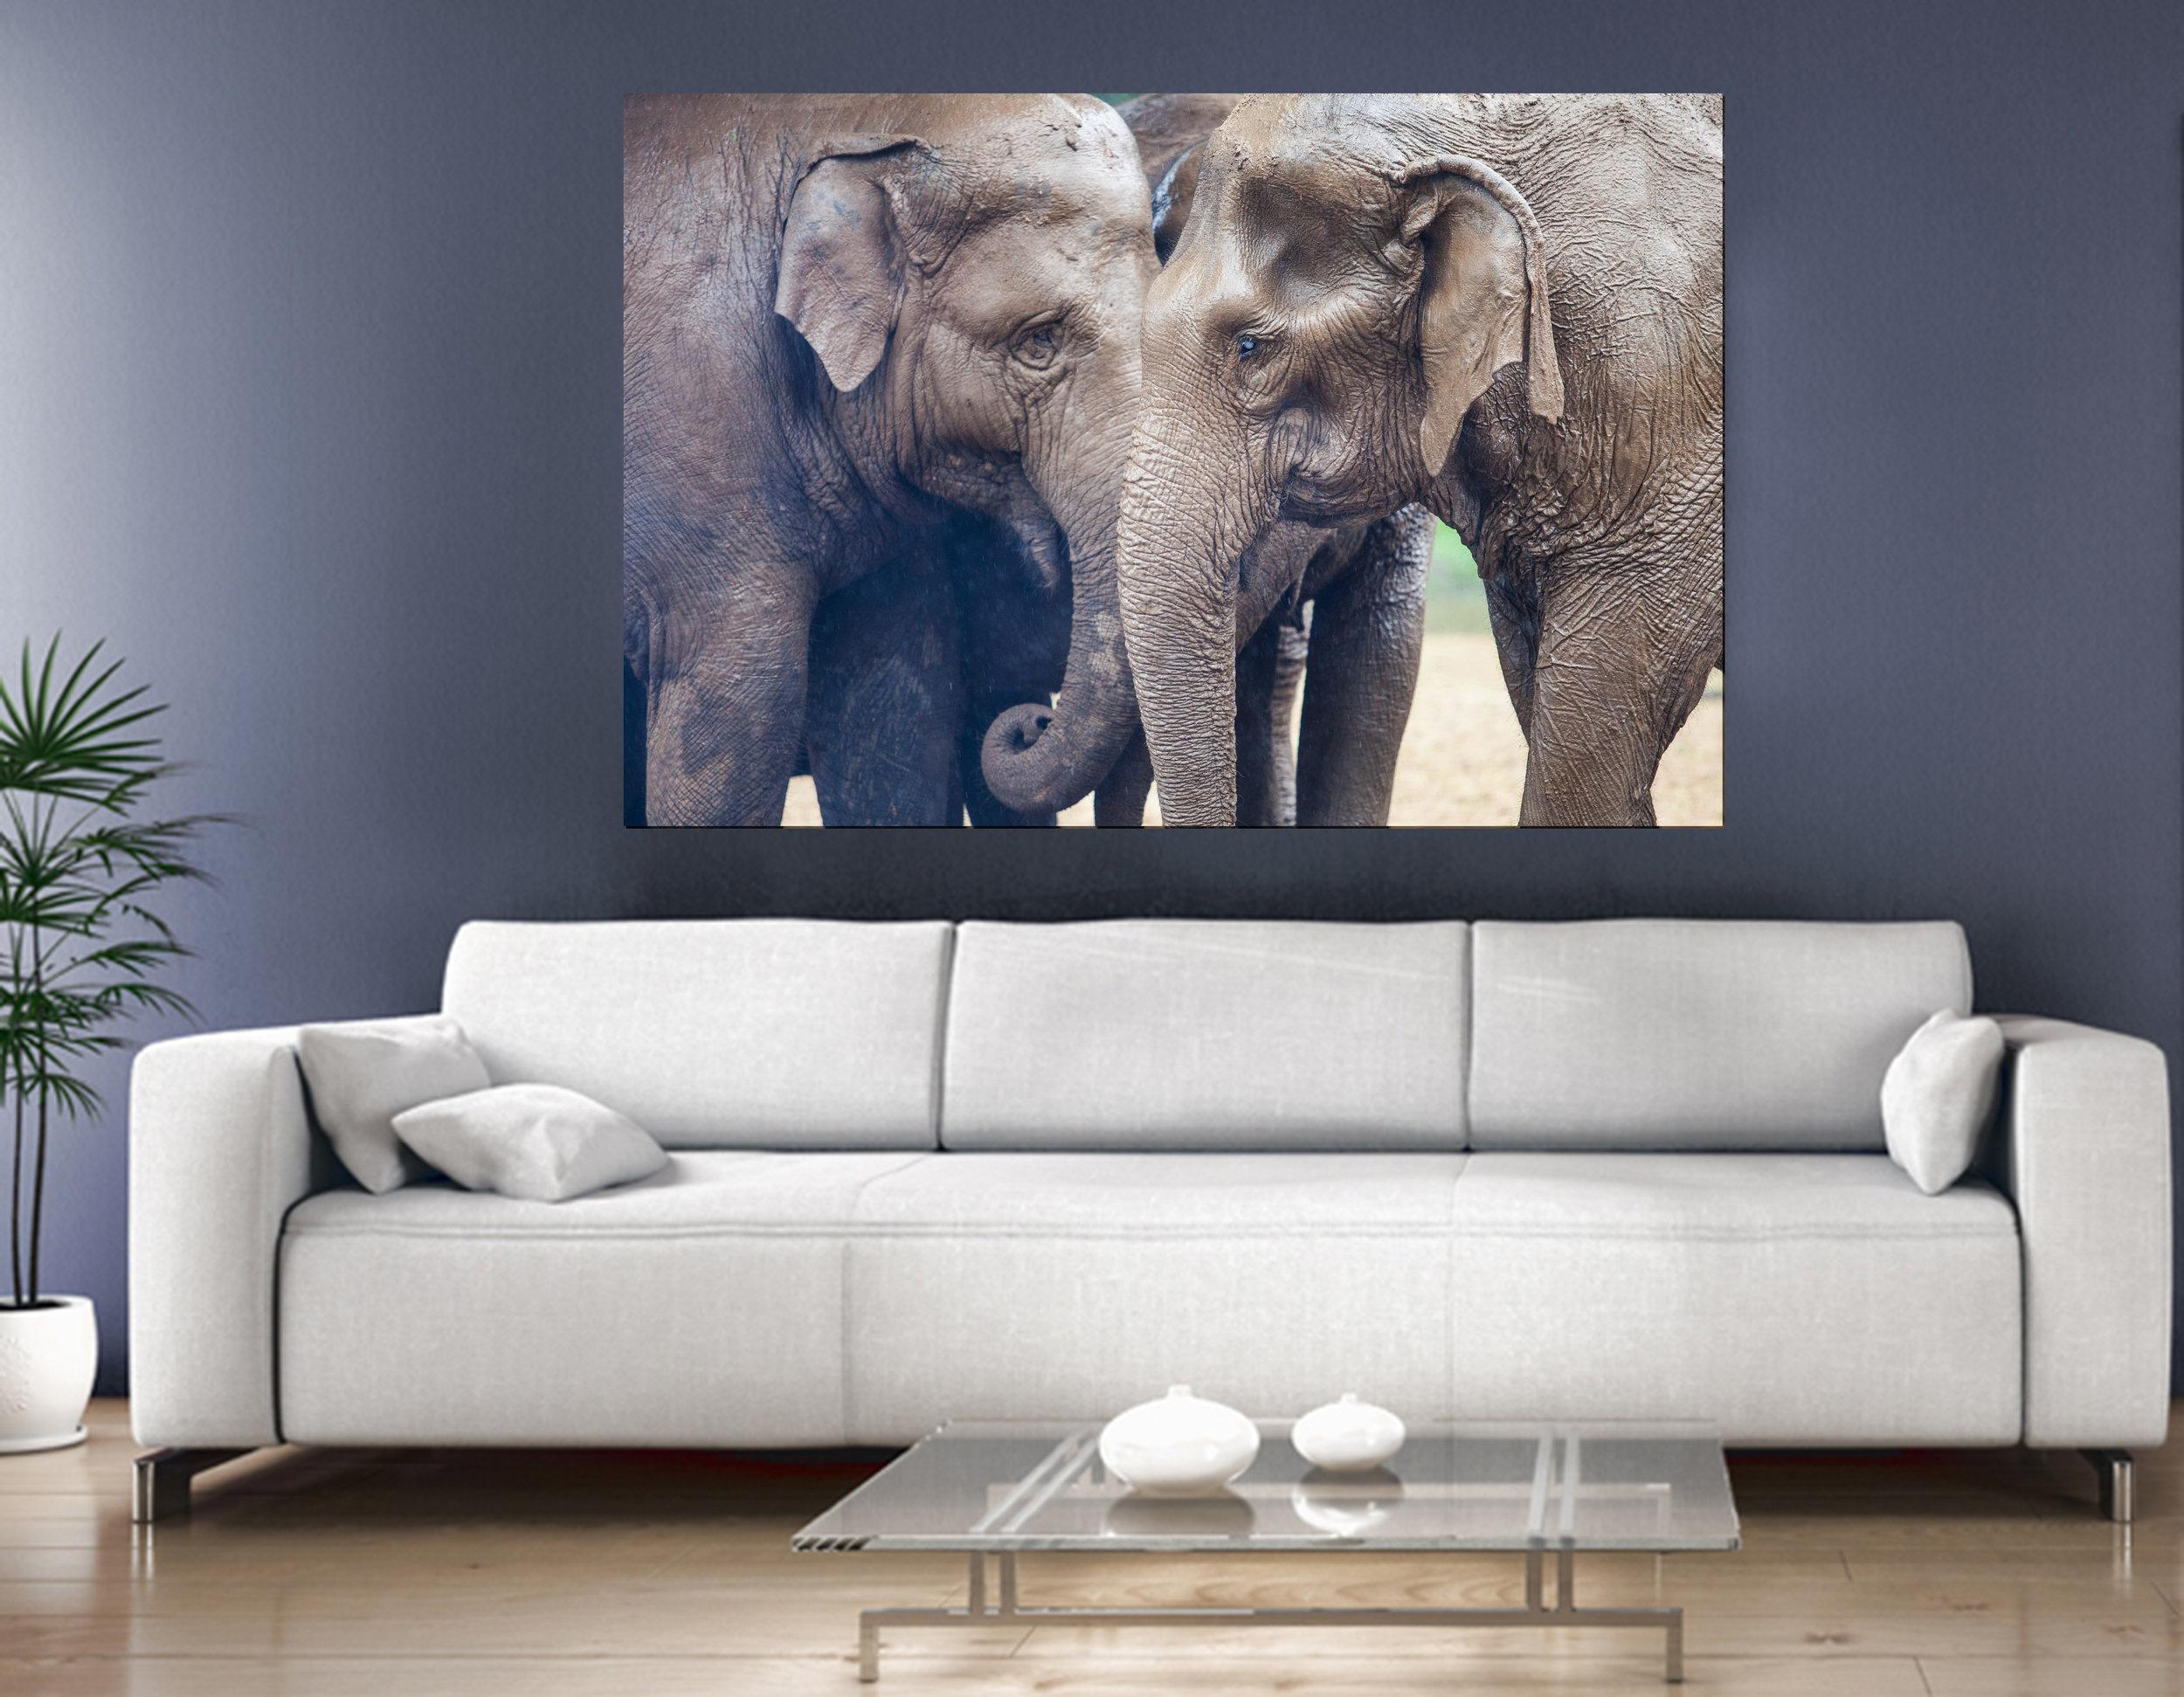 RE_Elephant_livingroom.jpg